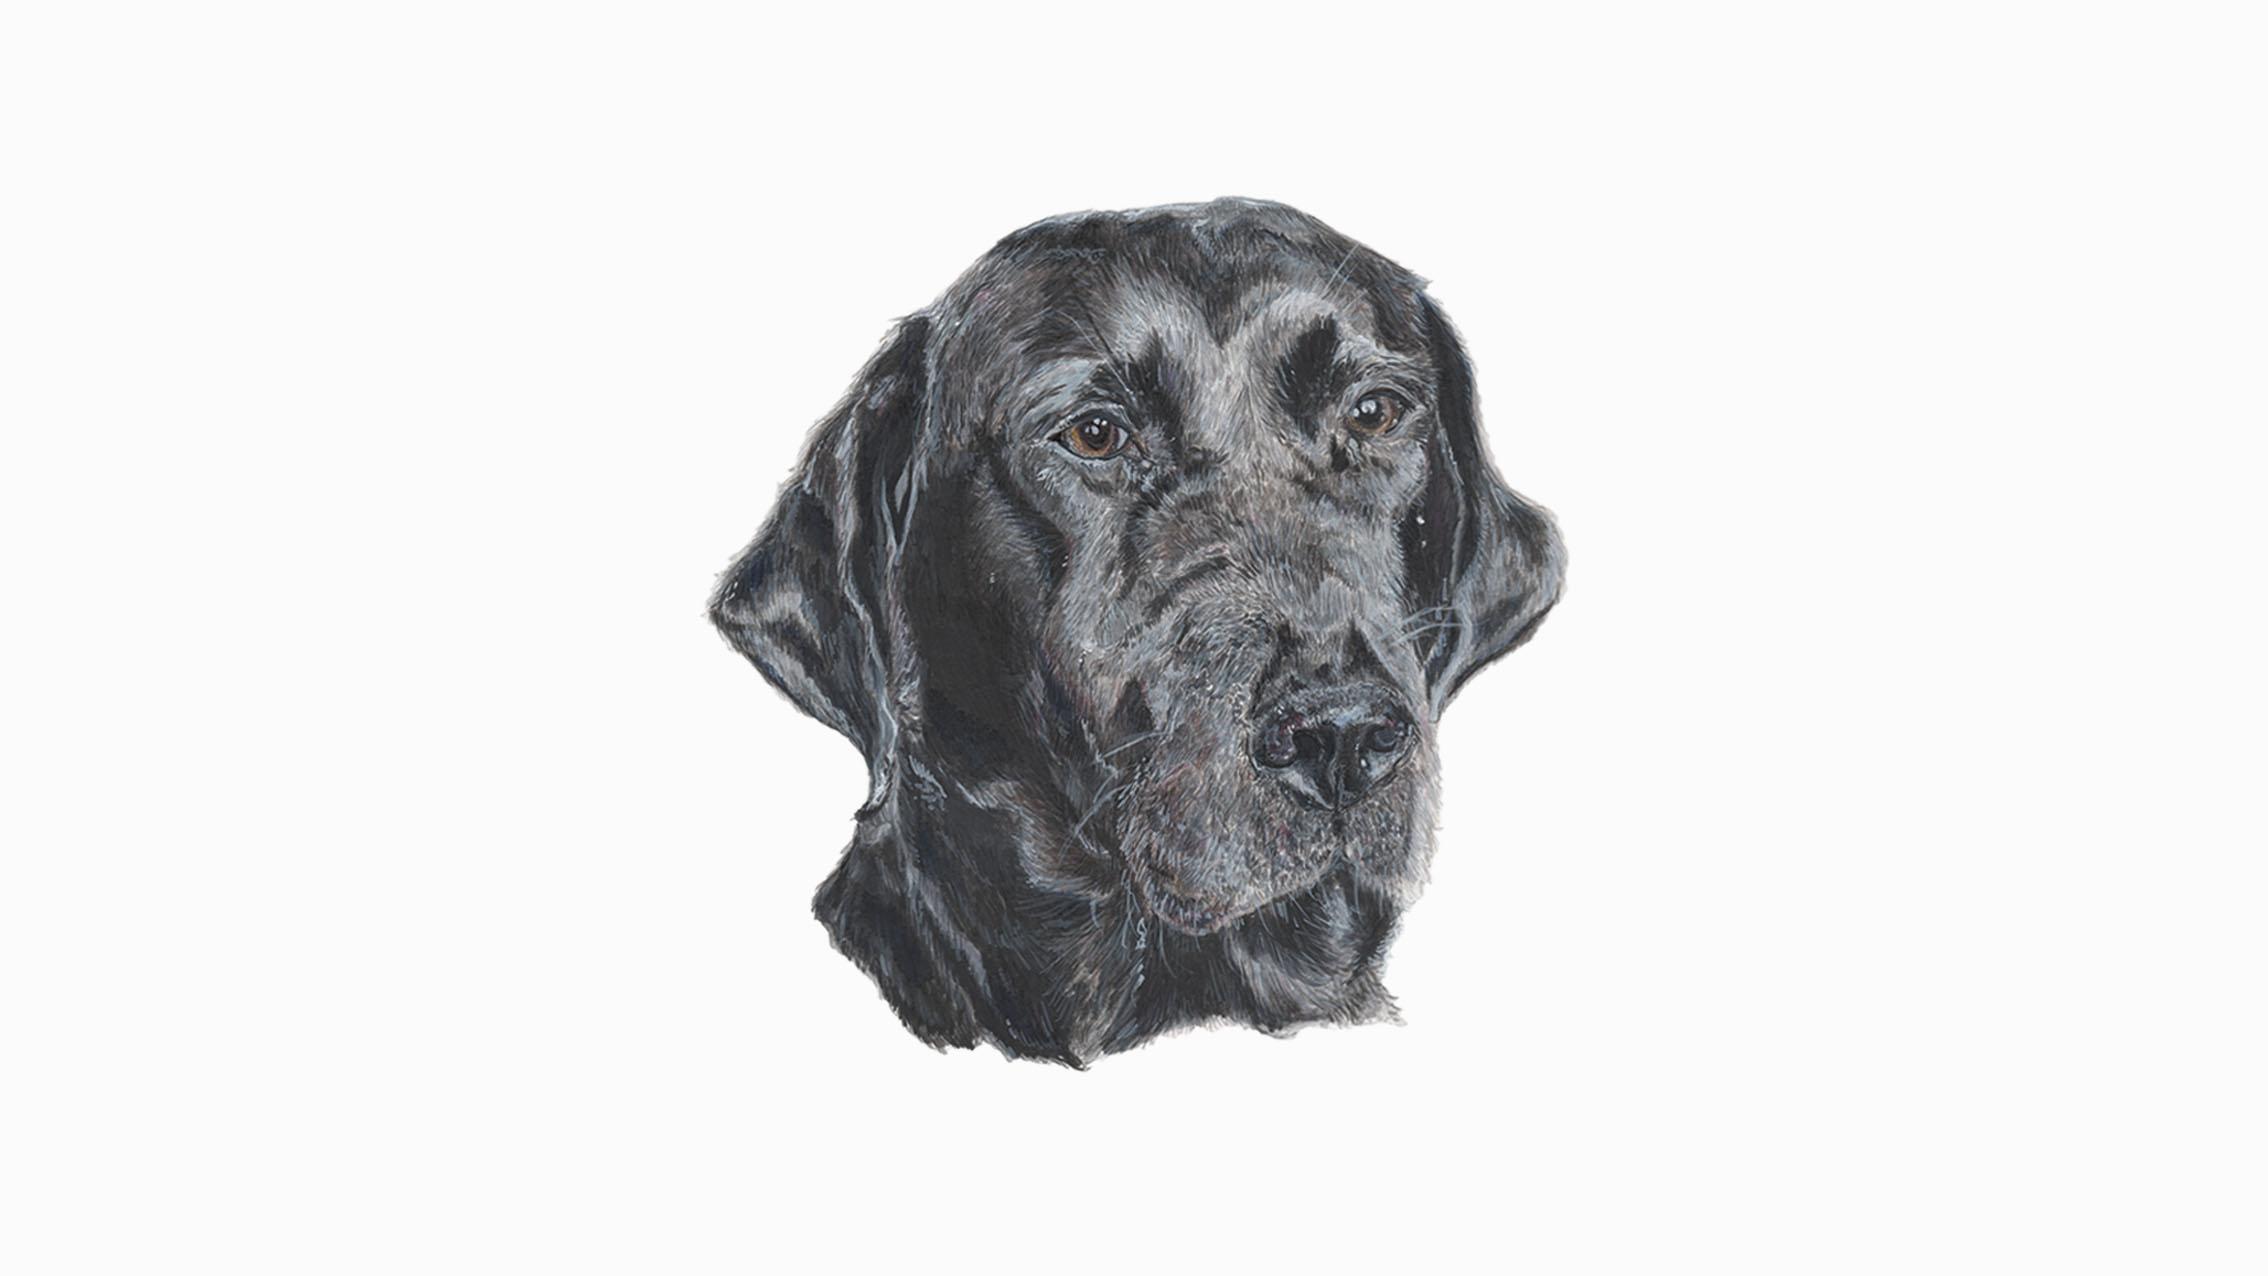 Poppy, the Labrador